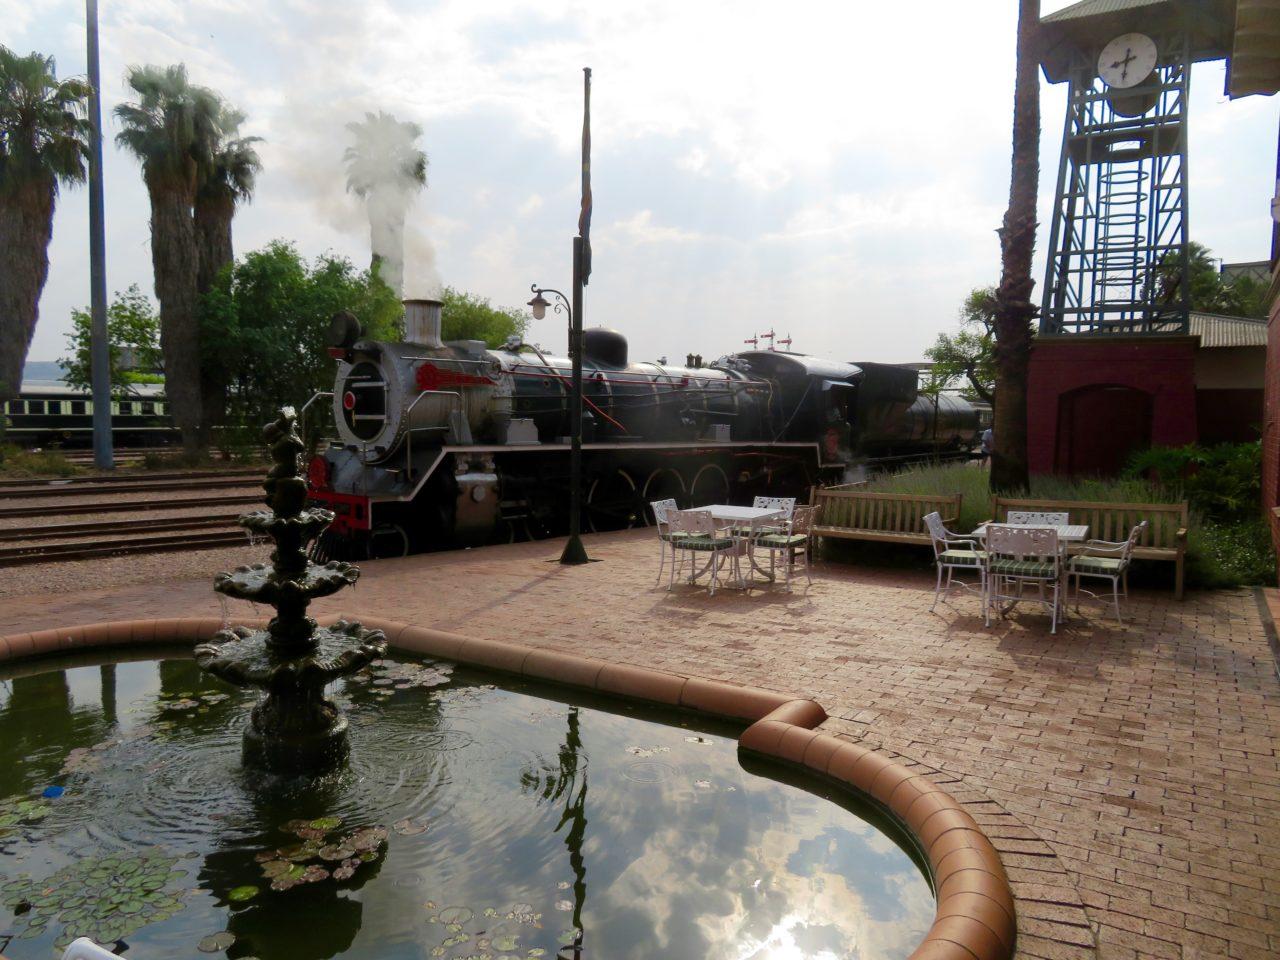 Rovos steam locomotive at the <strong>Rovos <em>Rail</em></strong> station in Pretoria, South Africa